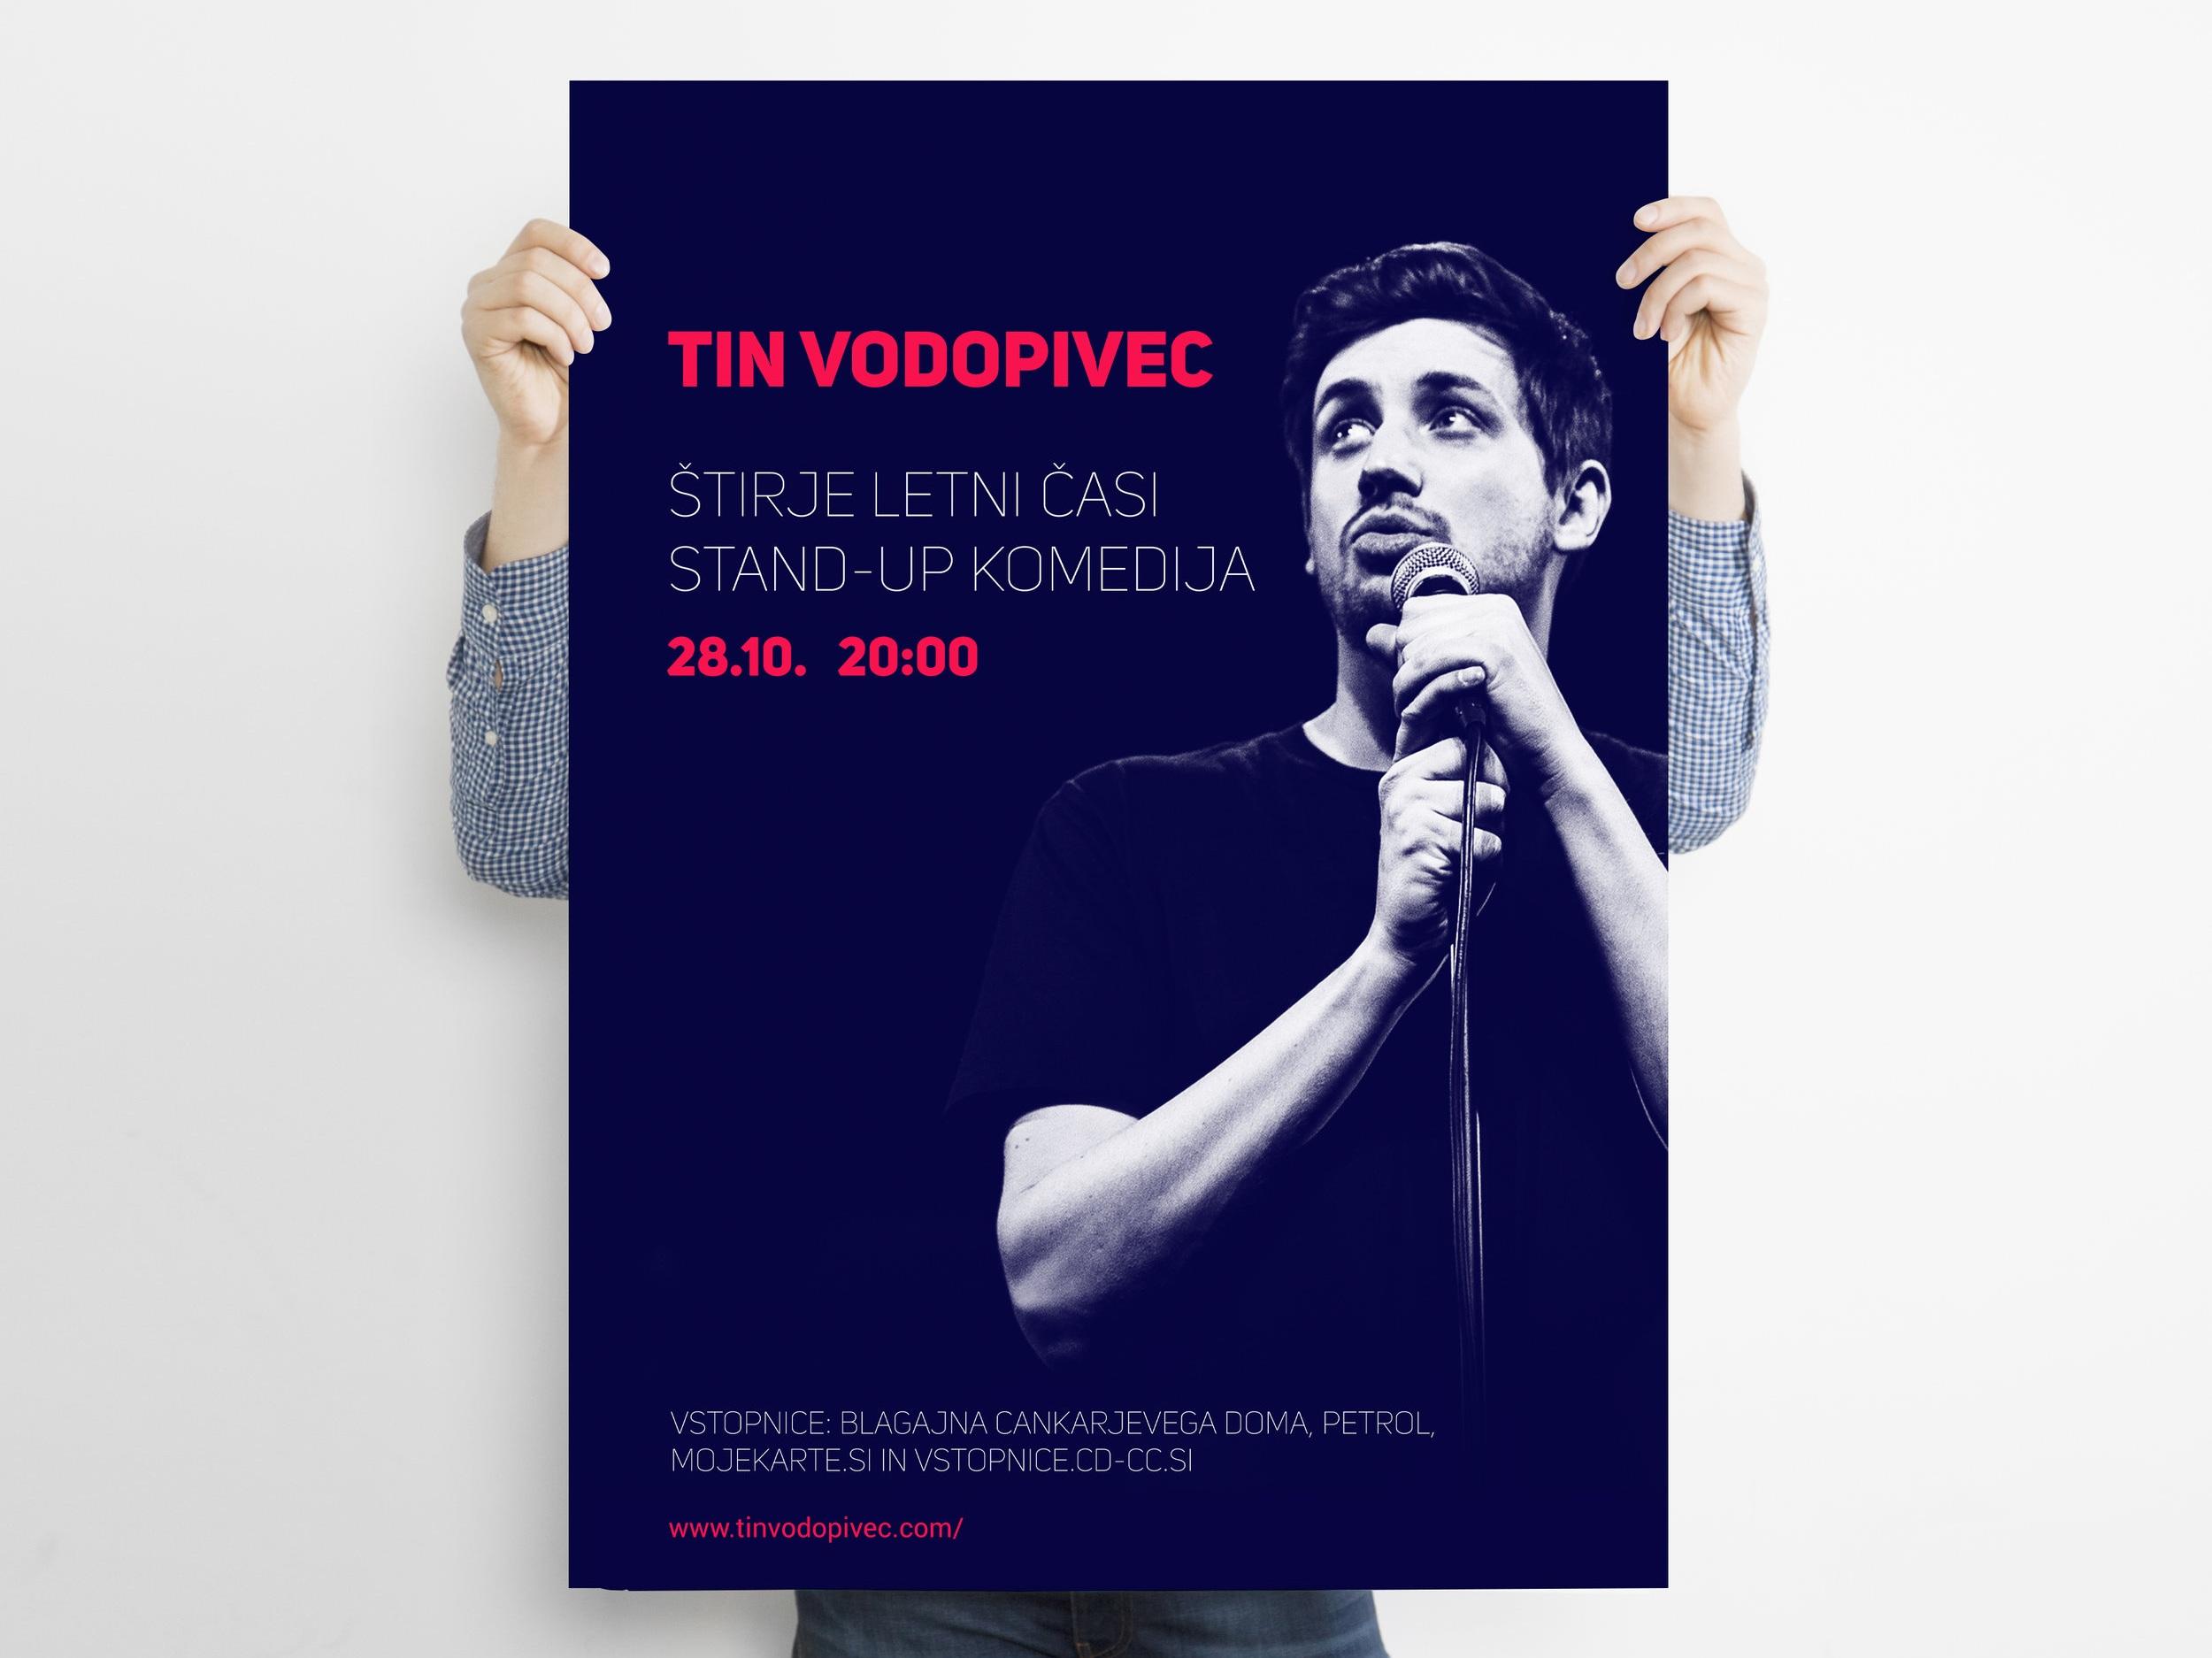 Free+Man+Holding+Advertisement+Poster+Mockup+PSD.jpg